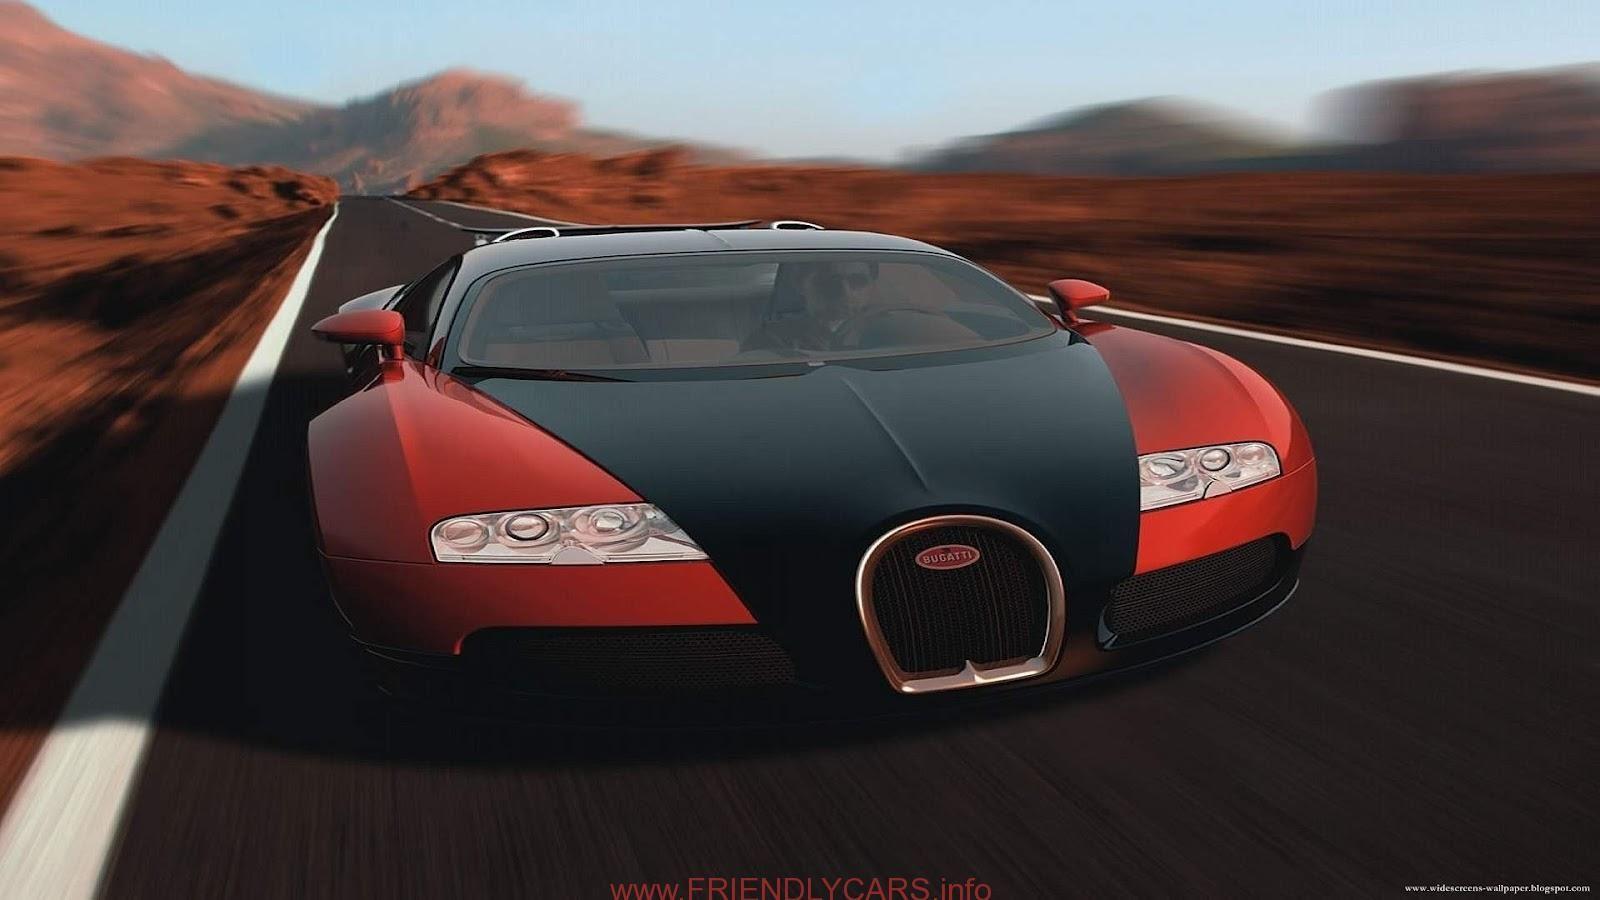 Red Bugatti Veyron Wallpaper Image Hd Alifiah Sites Bugatti Cars Bugatti Veyron Bugatti